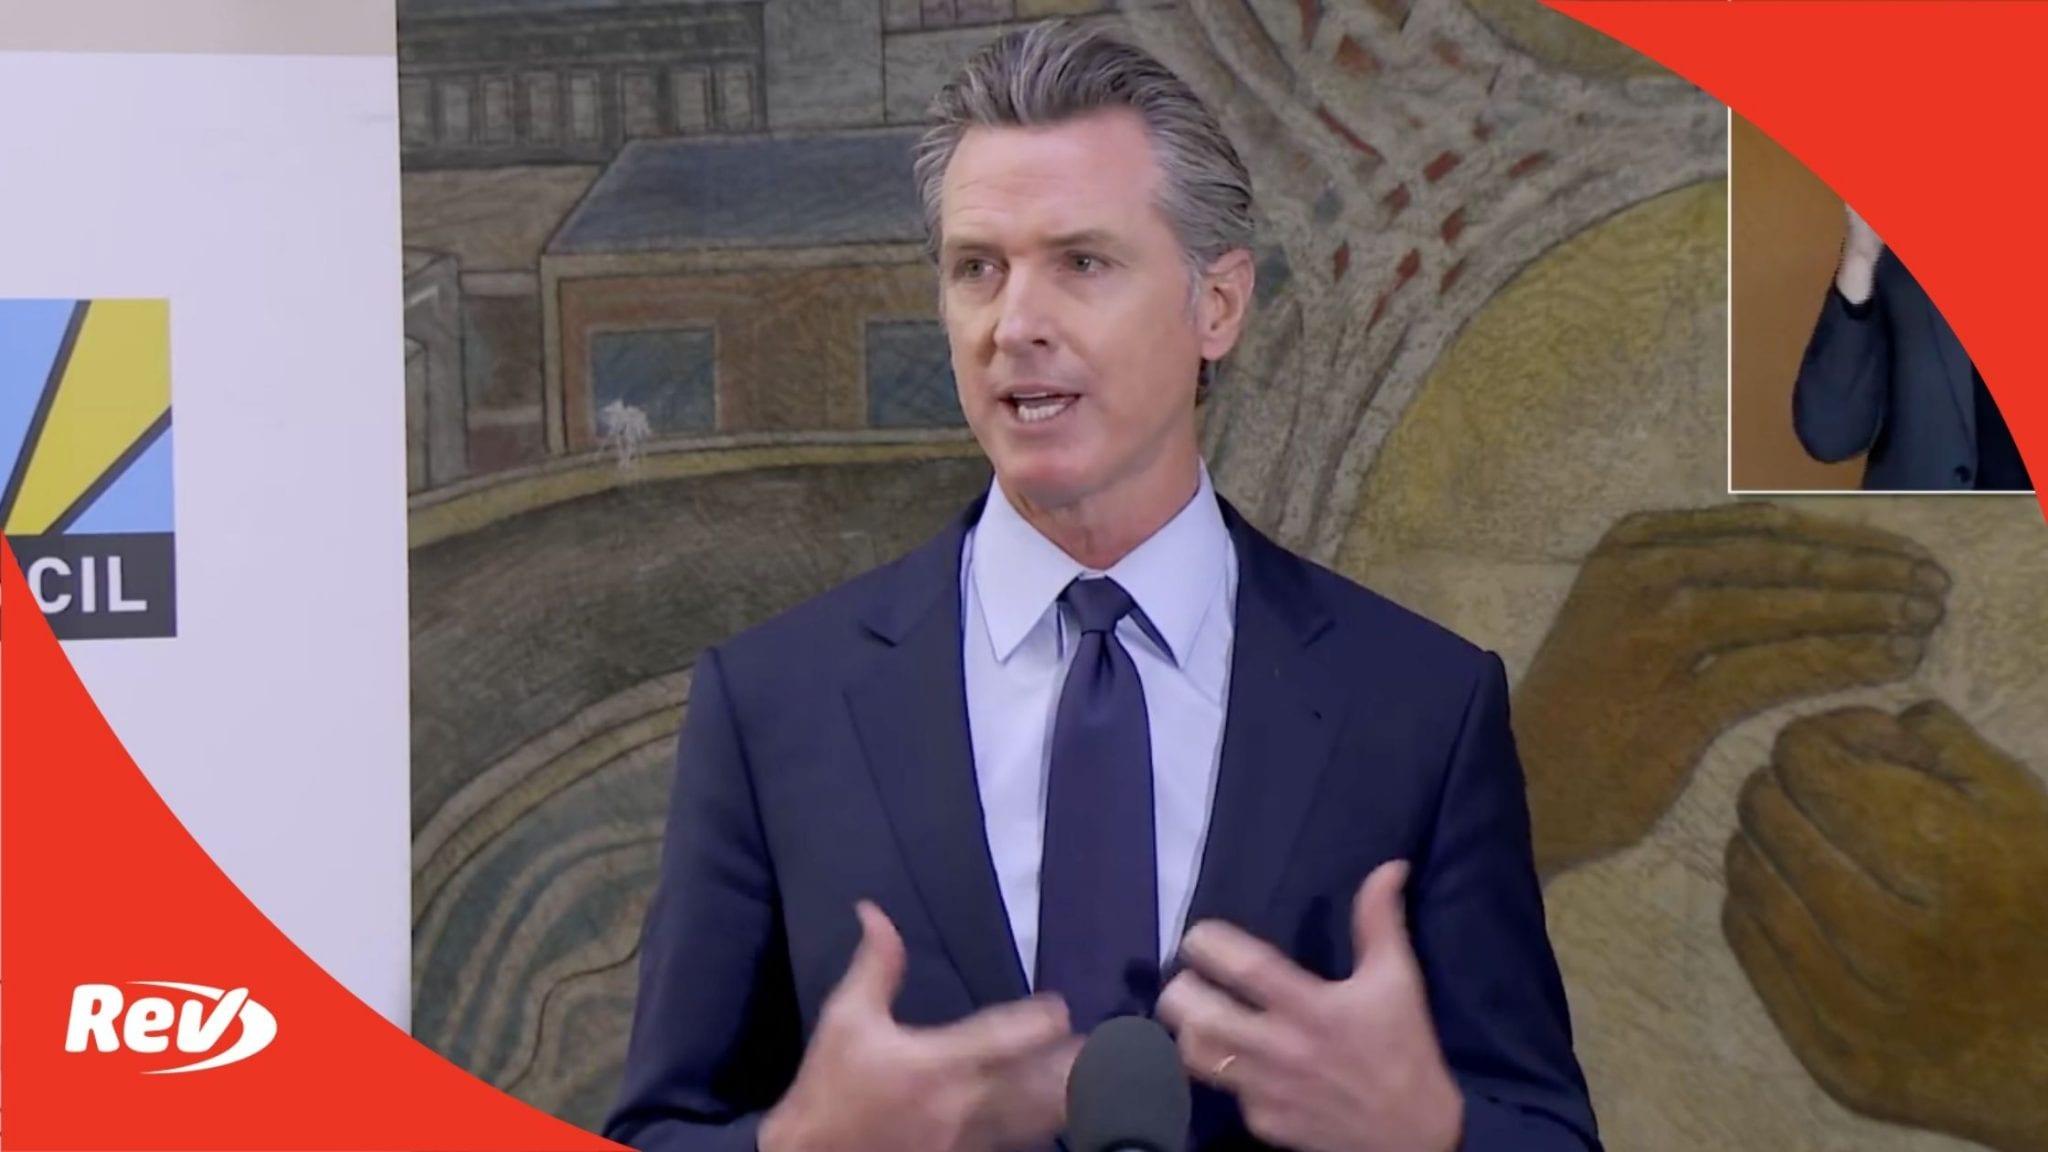 California Gov. Gavin Newsom Economic Recovery Press Conference Transcript May 10